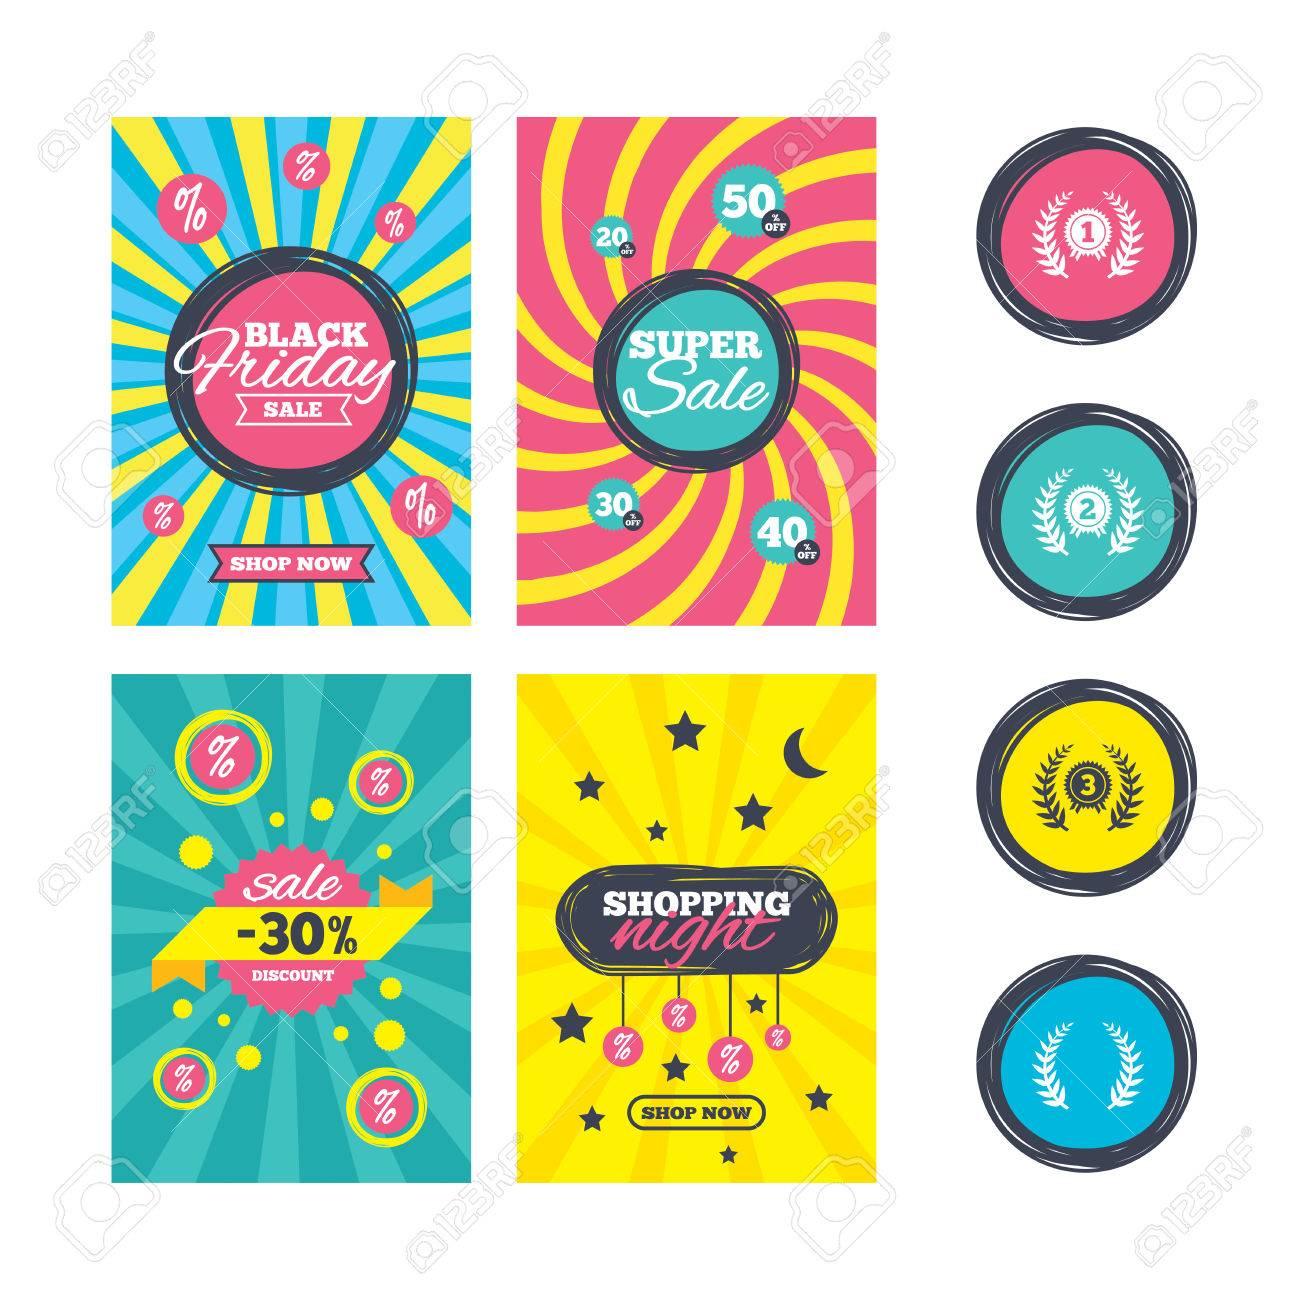 prize templates